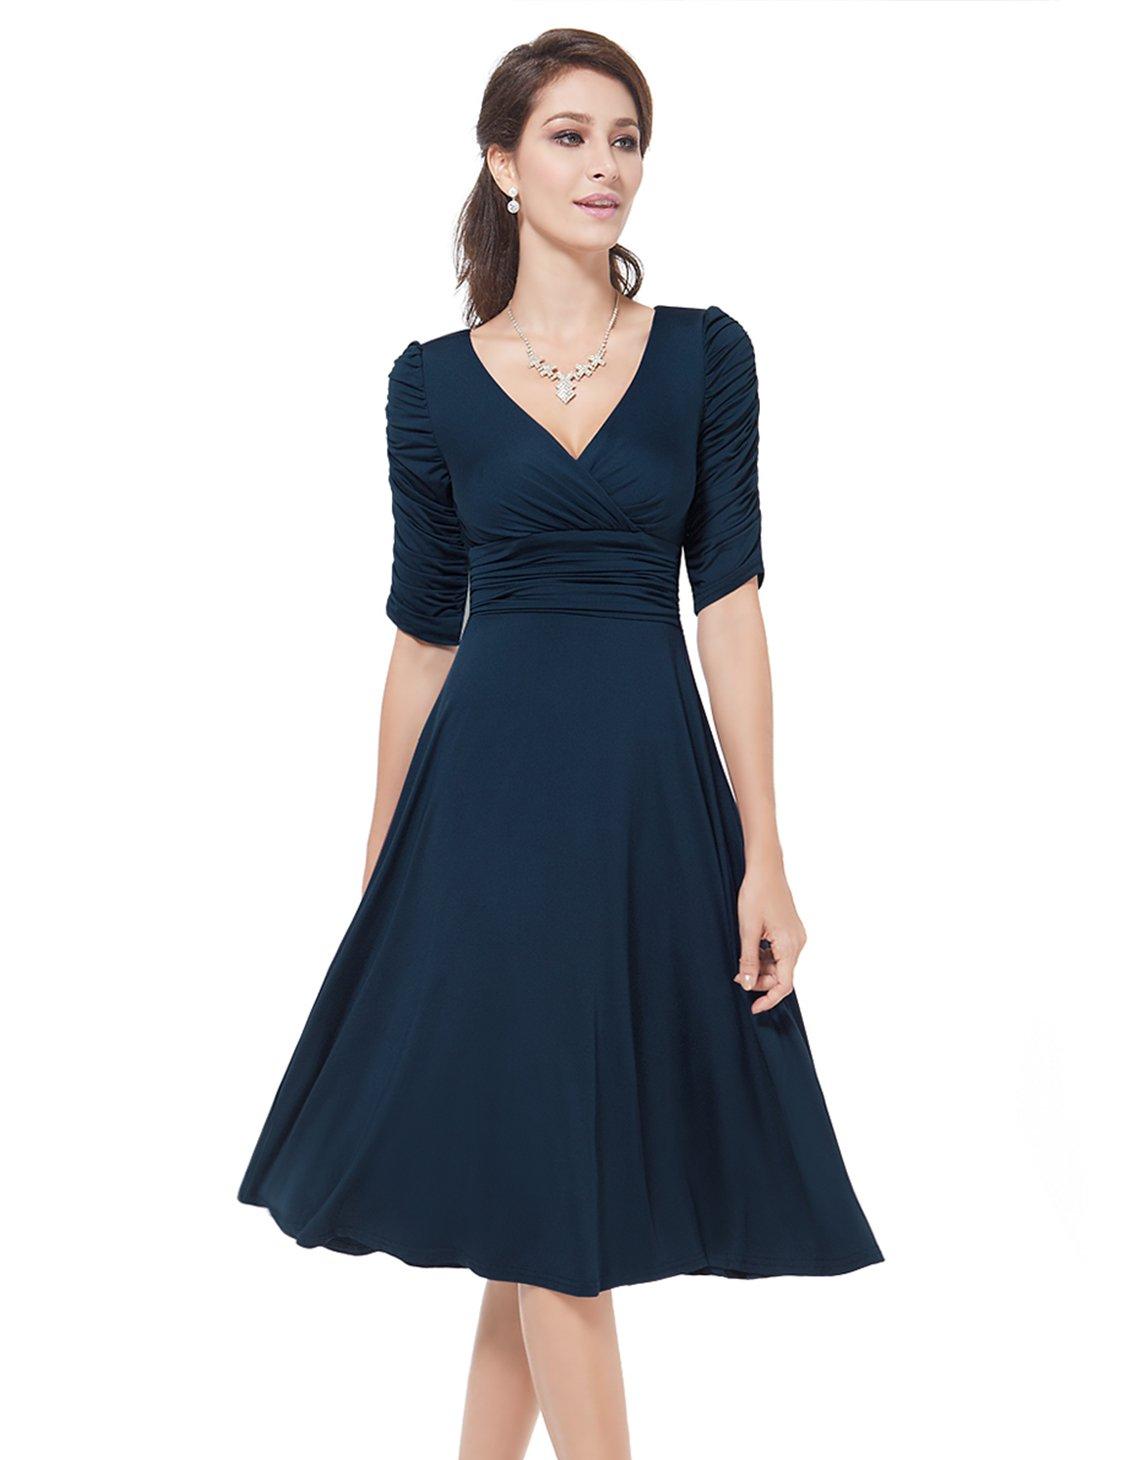 Women S Wedding Guest Dresses Amazon Com